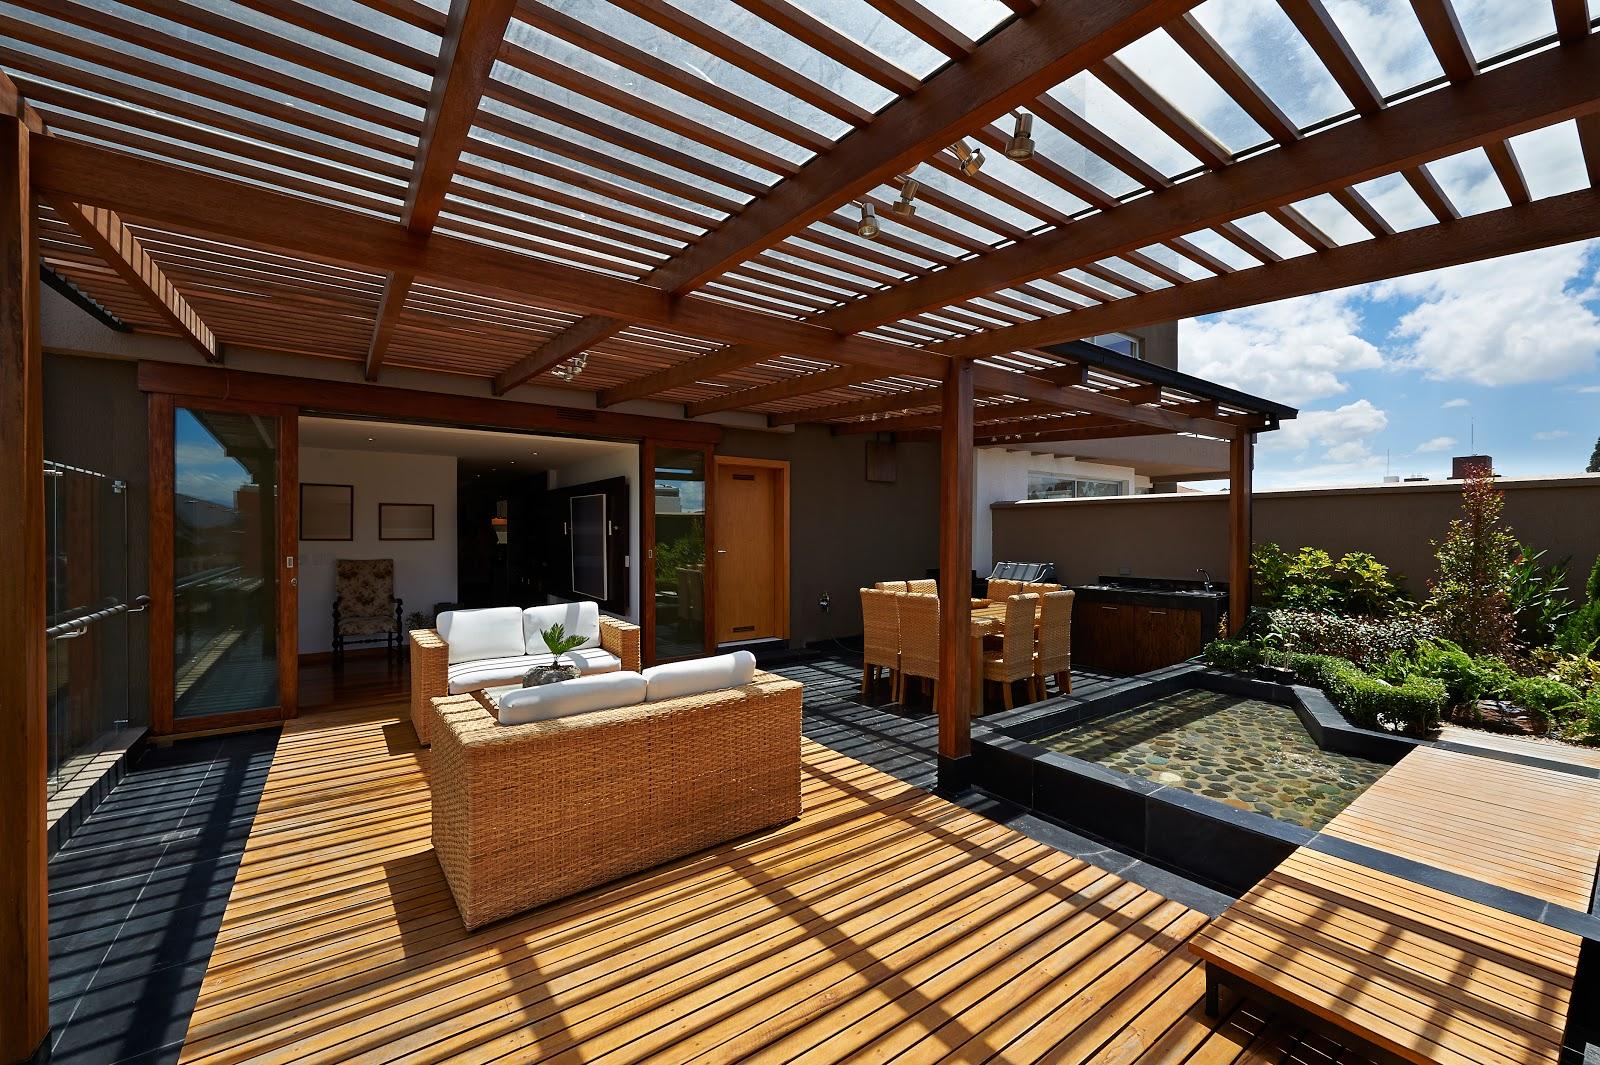 Avantaje si dezavantaje - podea terasa din lemn